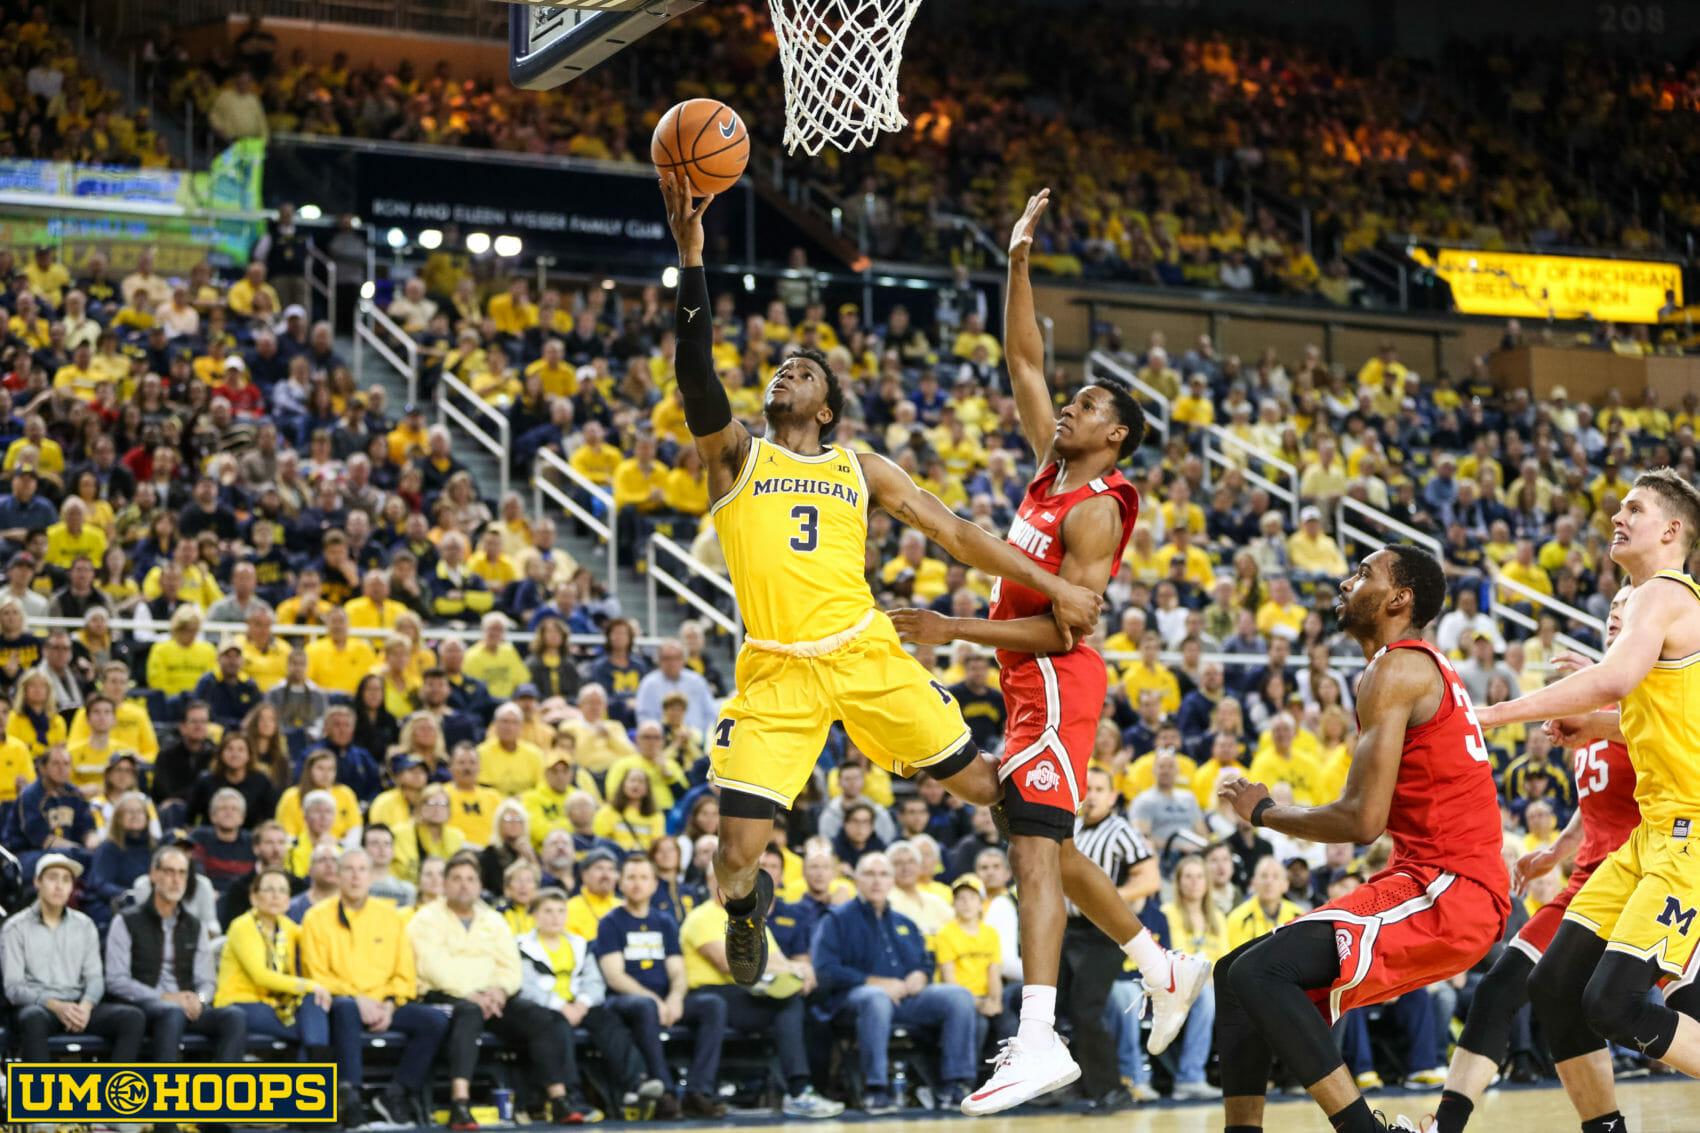 Michigan 74, Ohio State 62-17